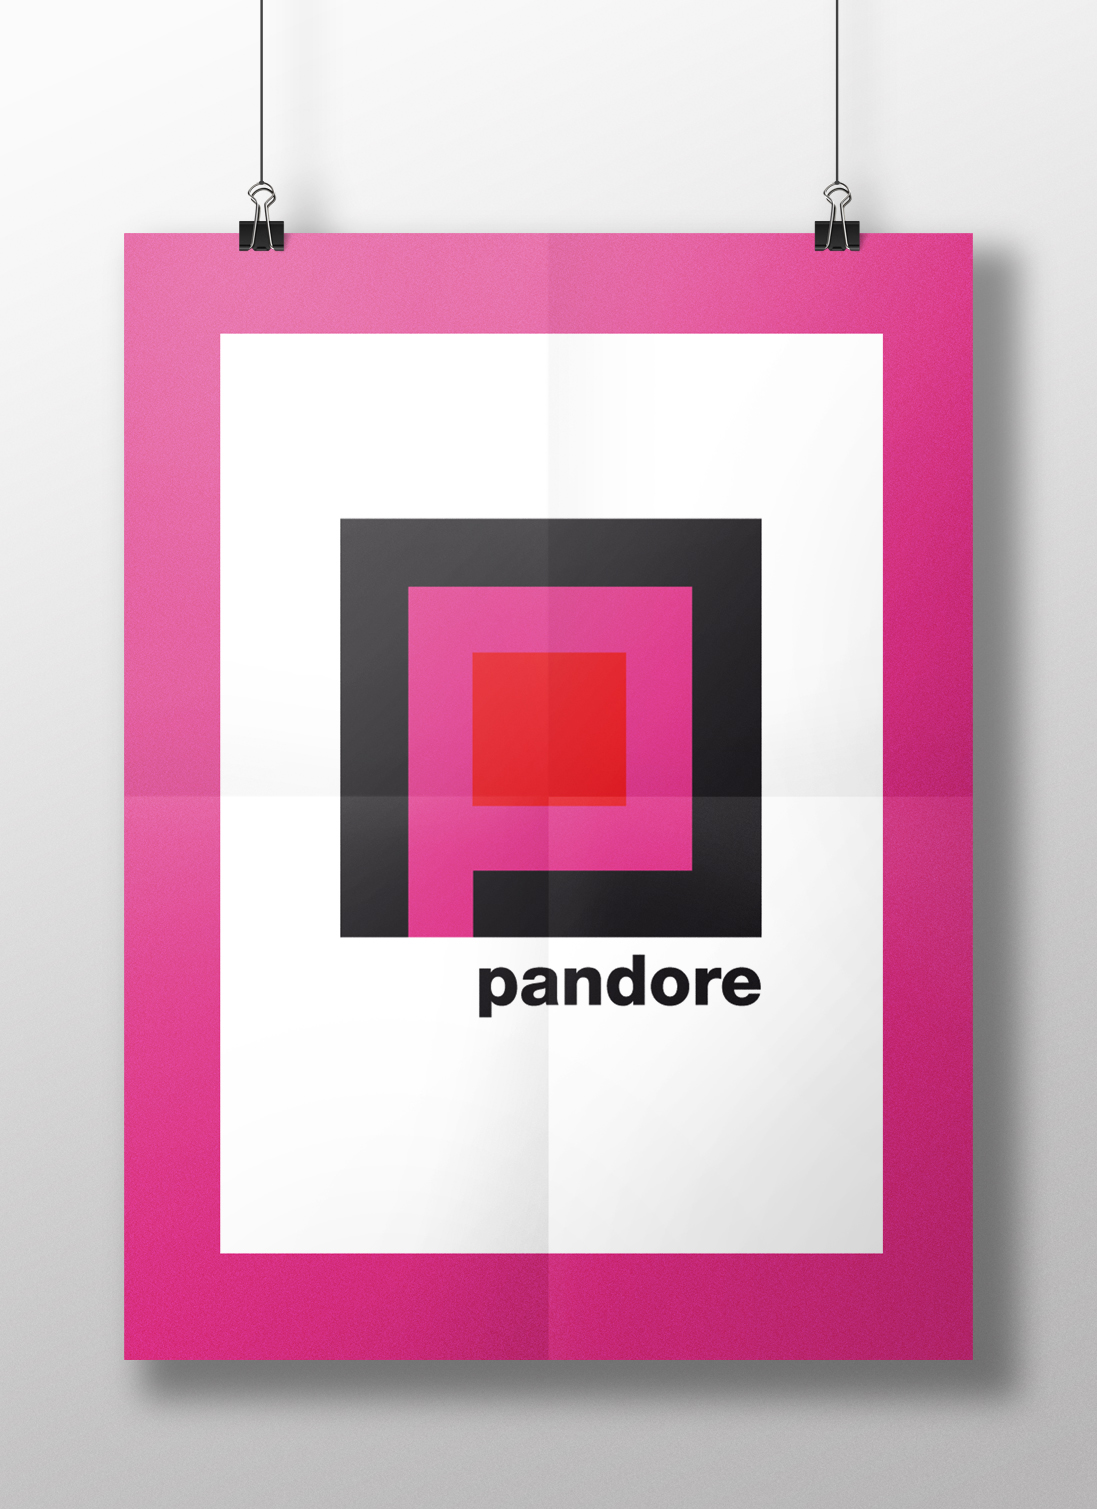 PANDORE-01